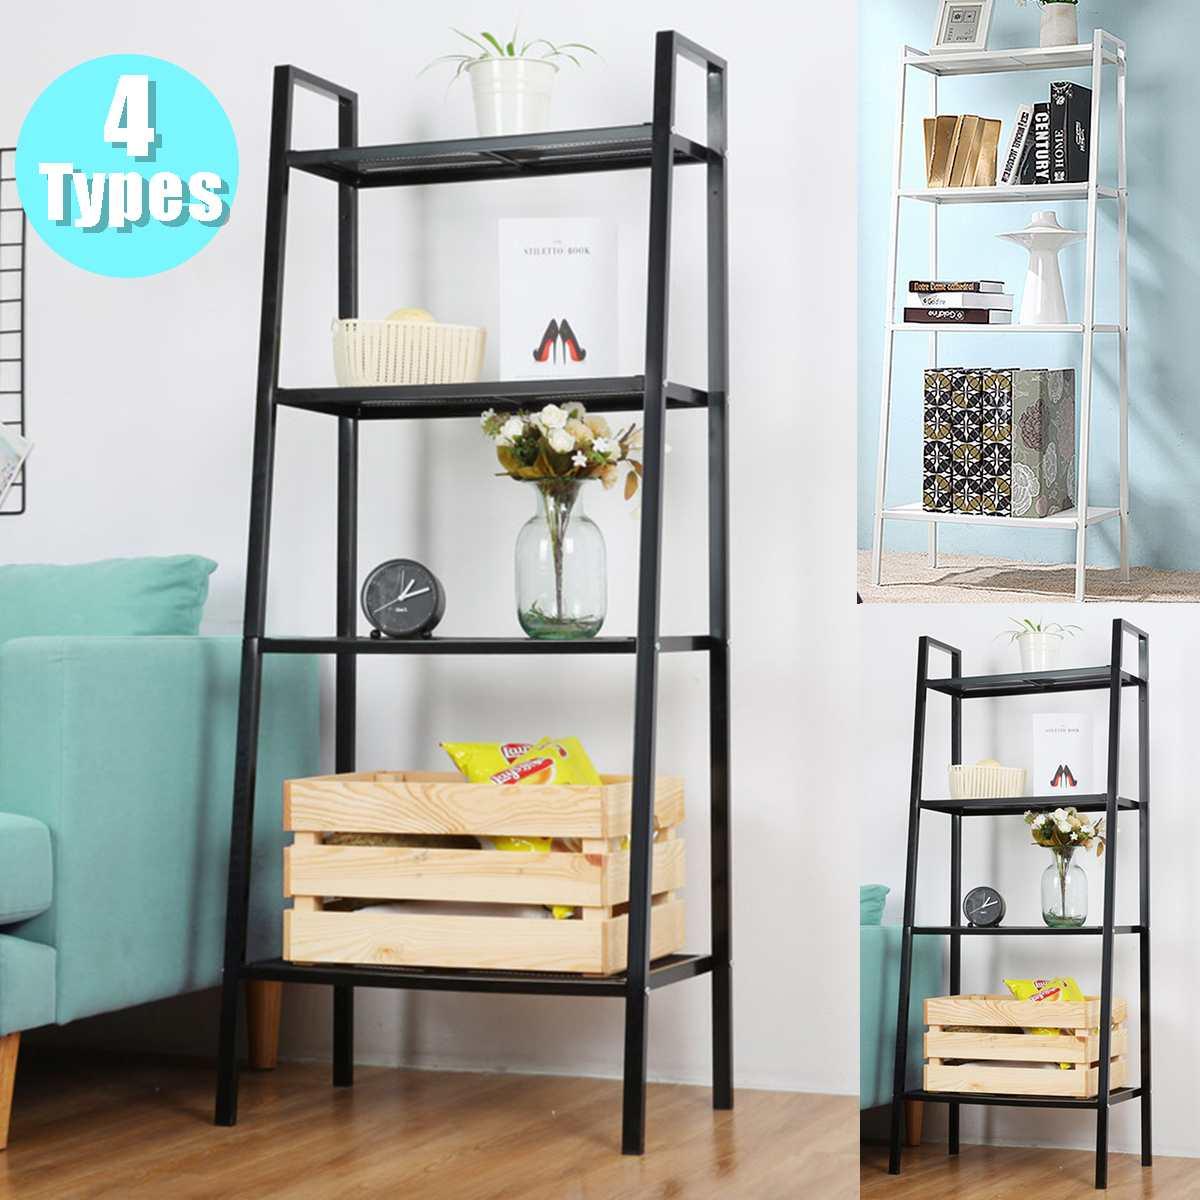 4-Tier Bookcase Bookshelf Leaning Wall Shelf Ladder Storage Display Rack Stand